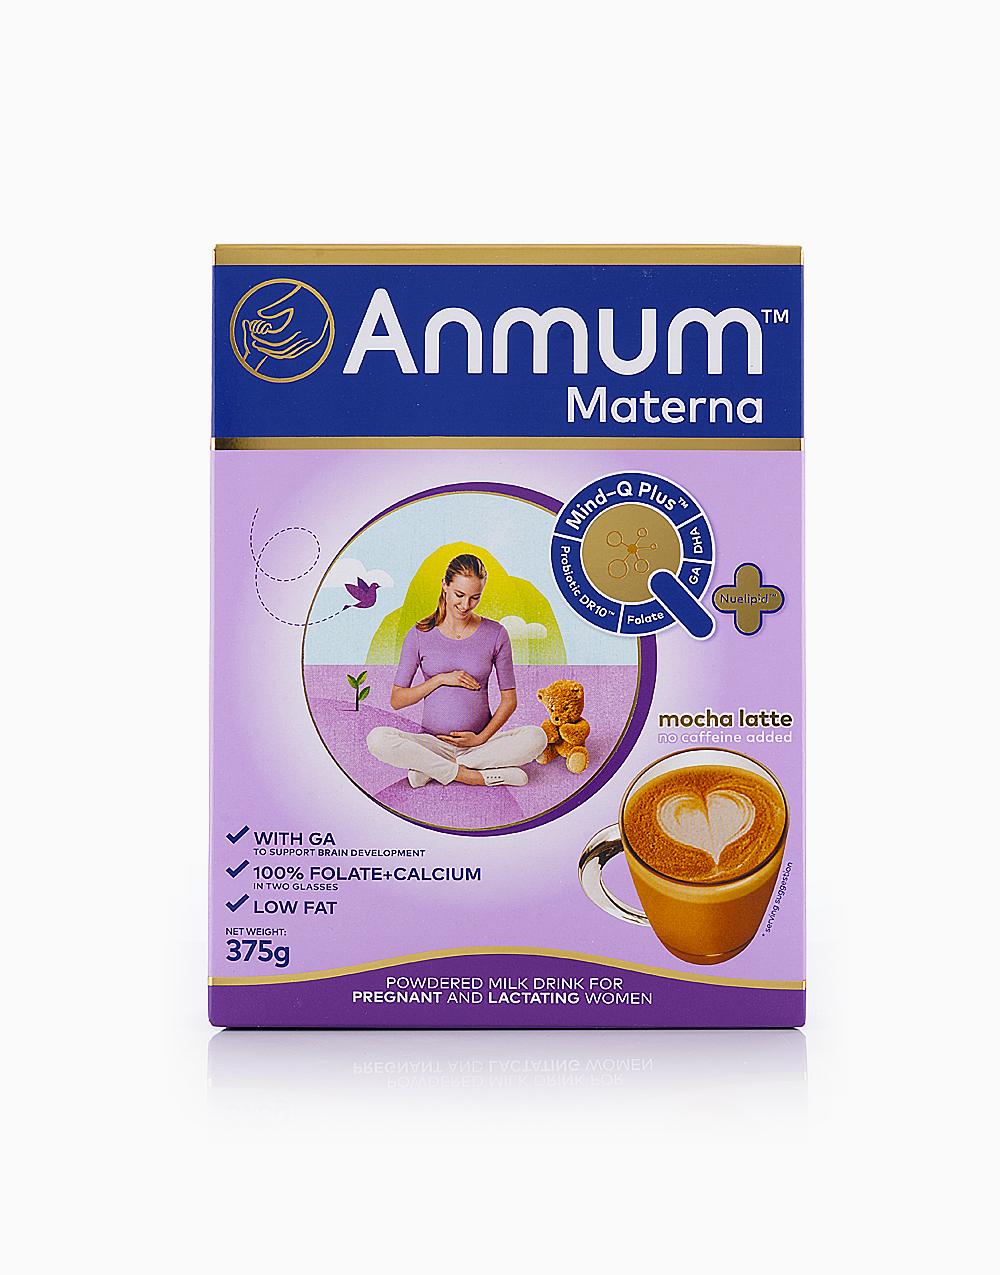 Anmum Materna Mocha Latte (375g) by Anmum